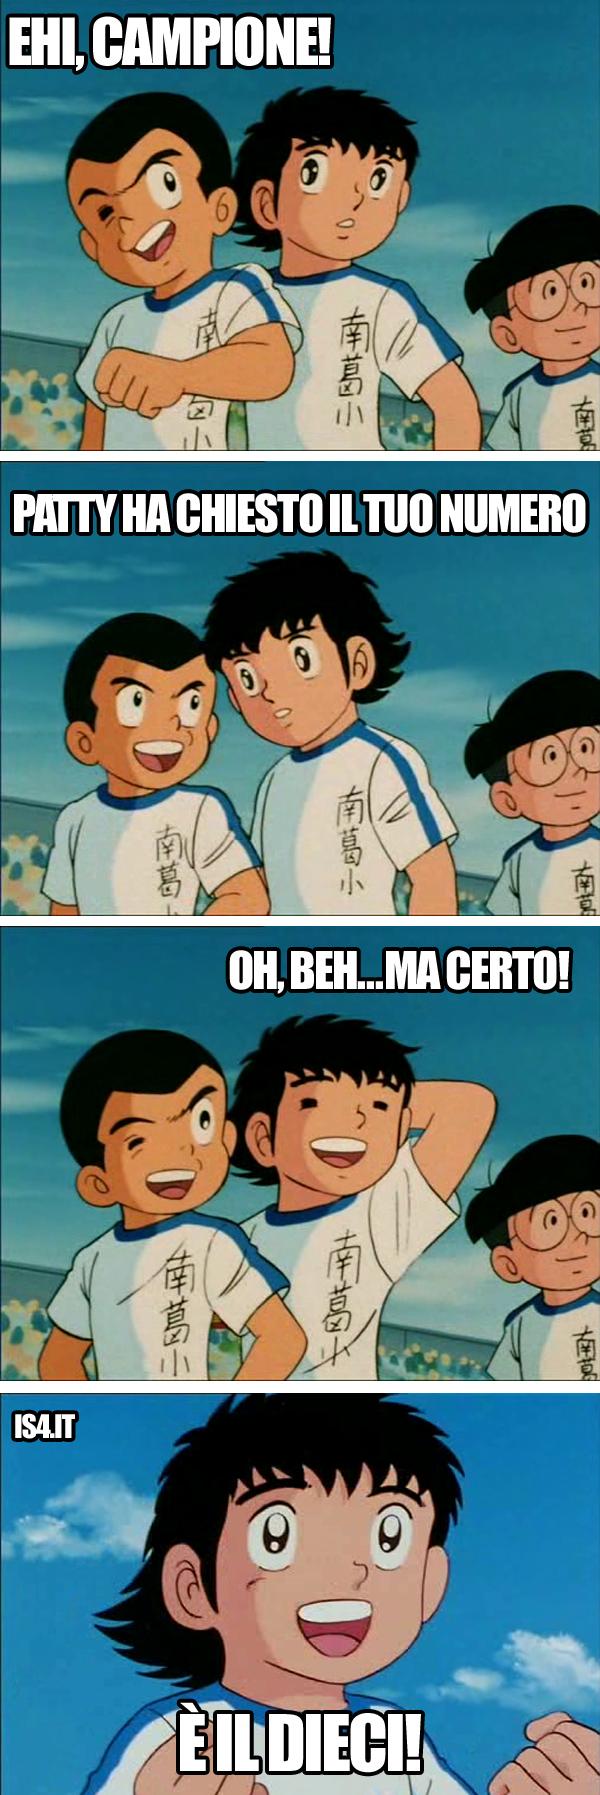 Holly & Benji, Capitan Tsubasa meme ita - Numero!